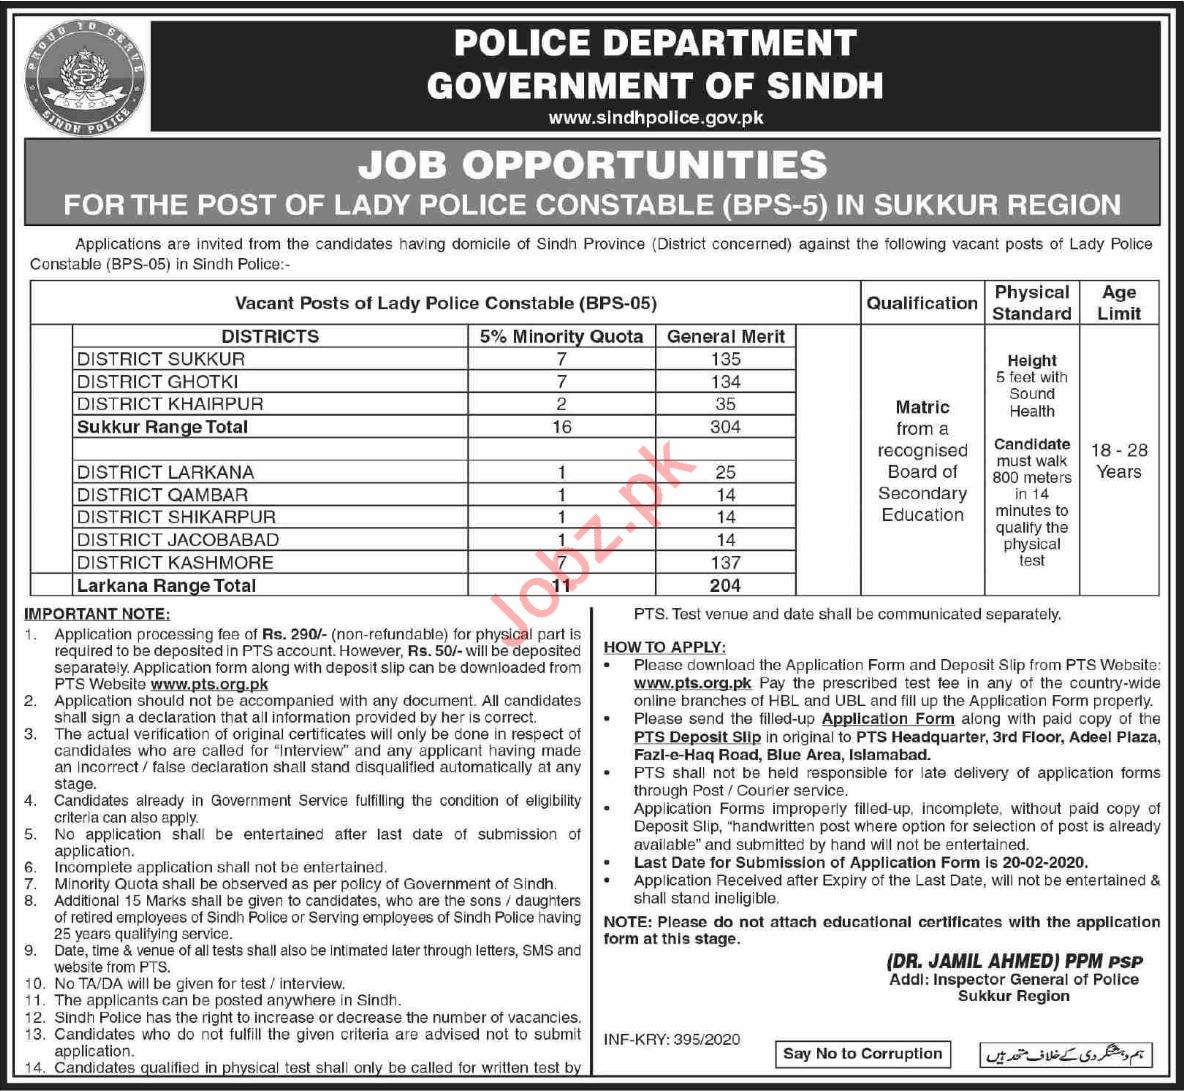 Sukkur Region Police Department Sindh Lady Constable Jobs